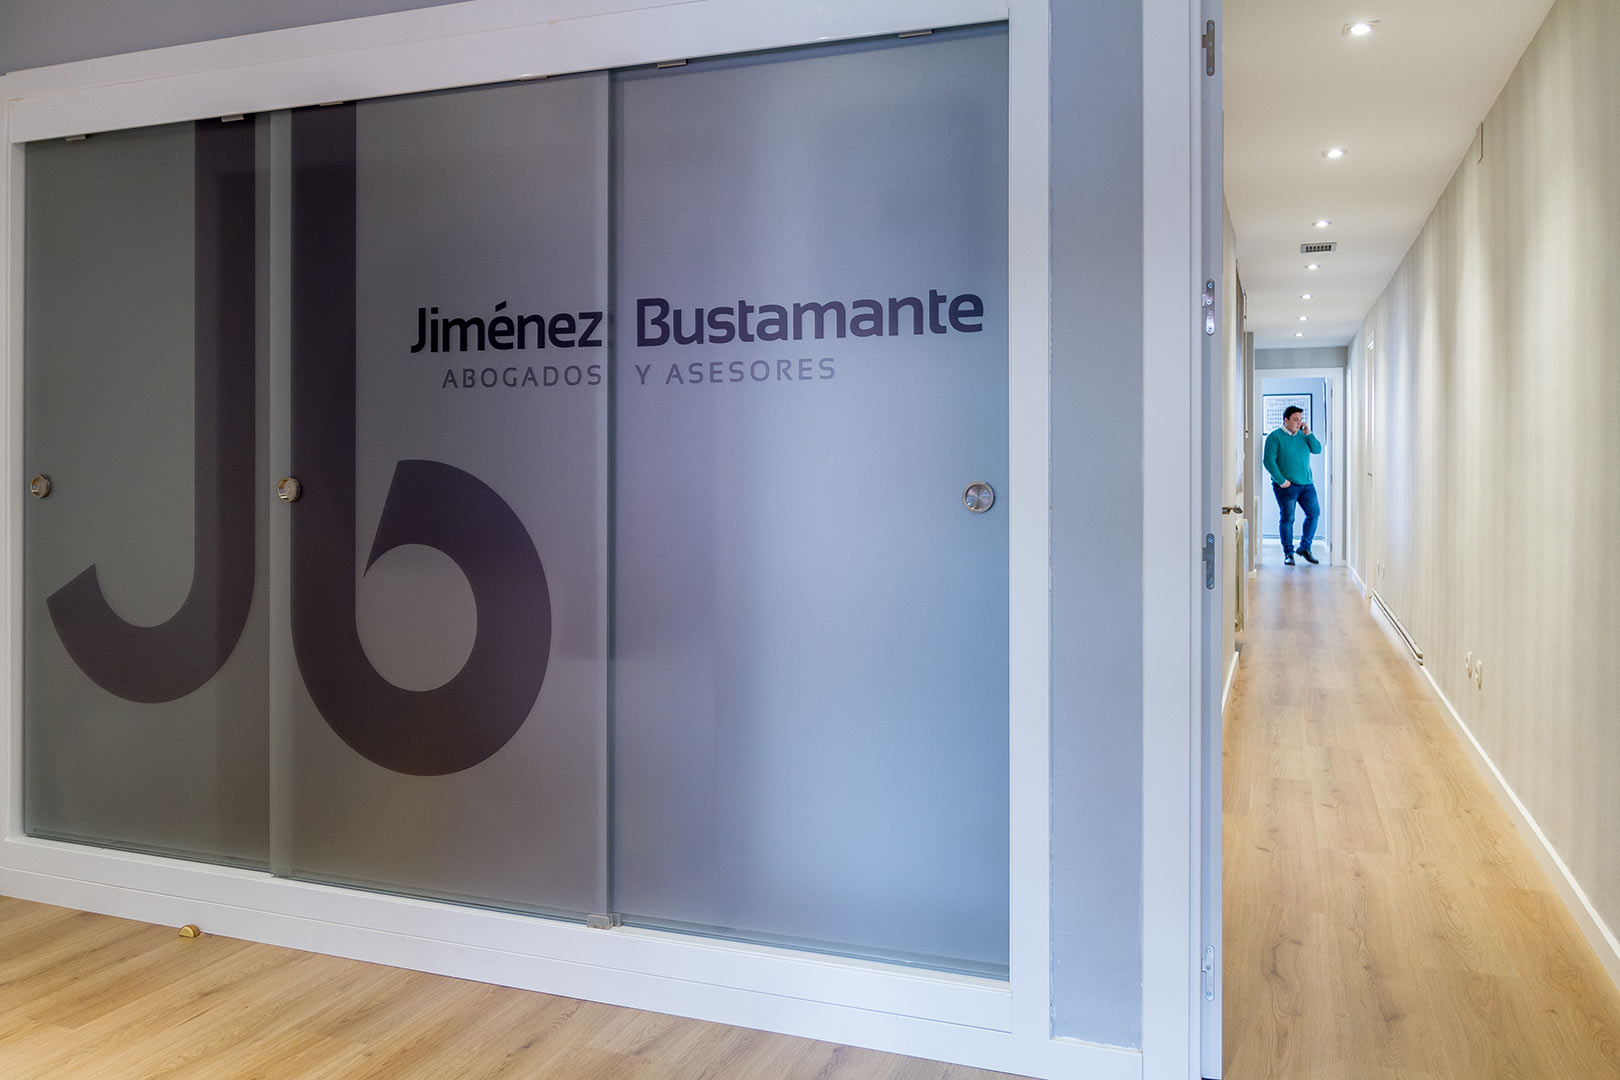 entrada Jimenéz Bustamante Abogados y asesores